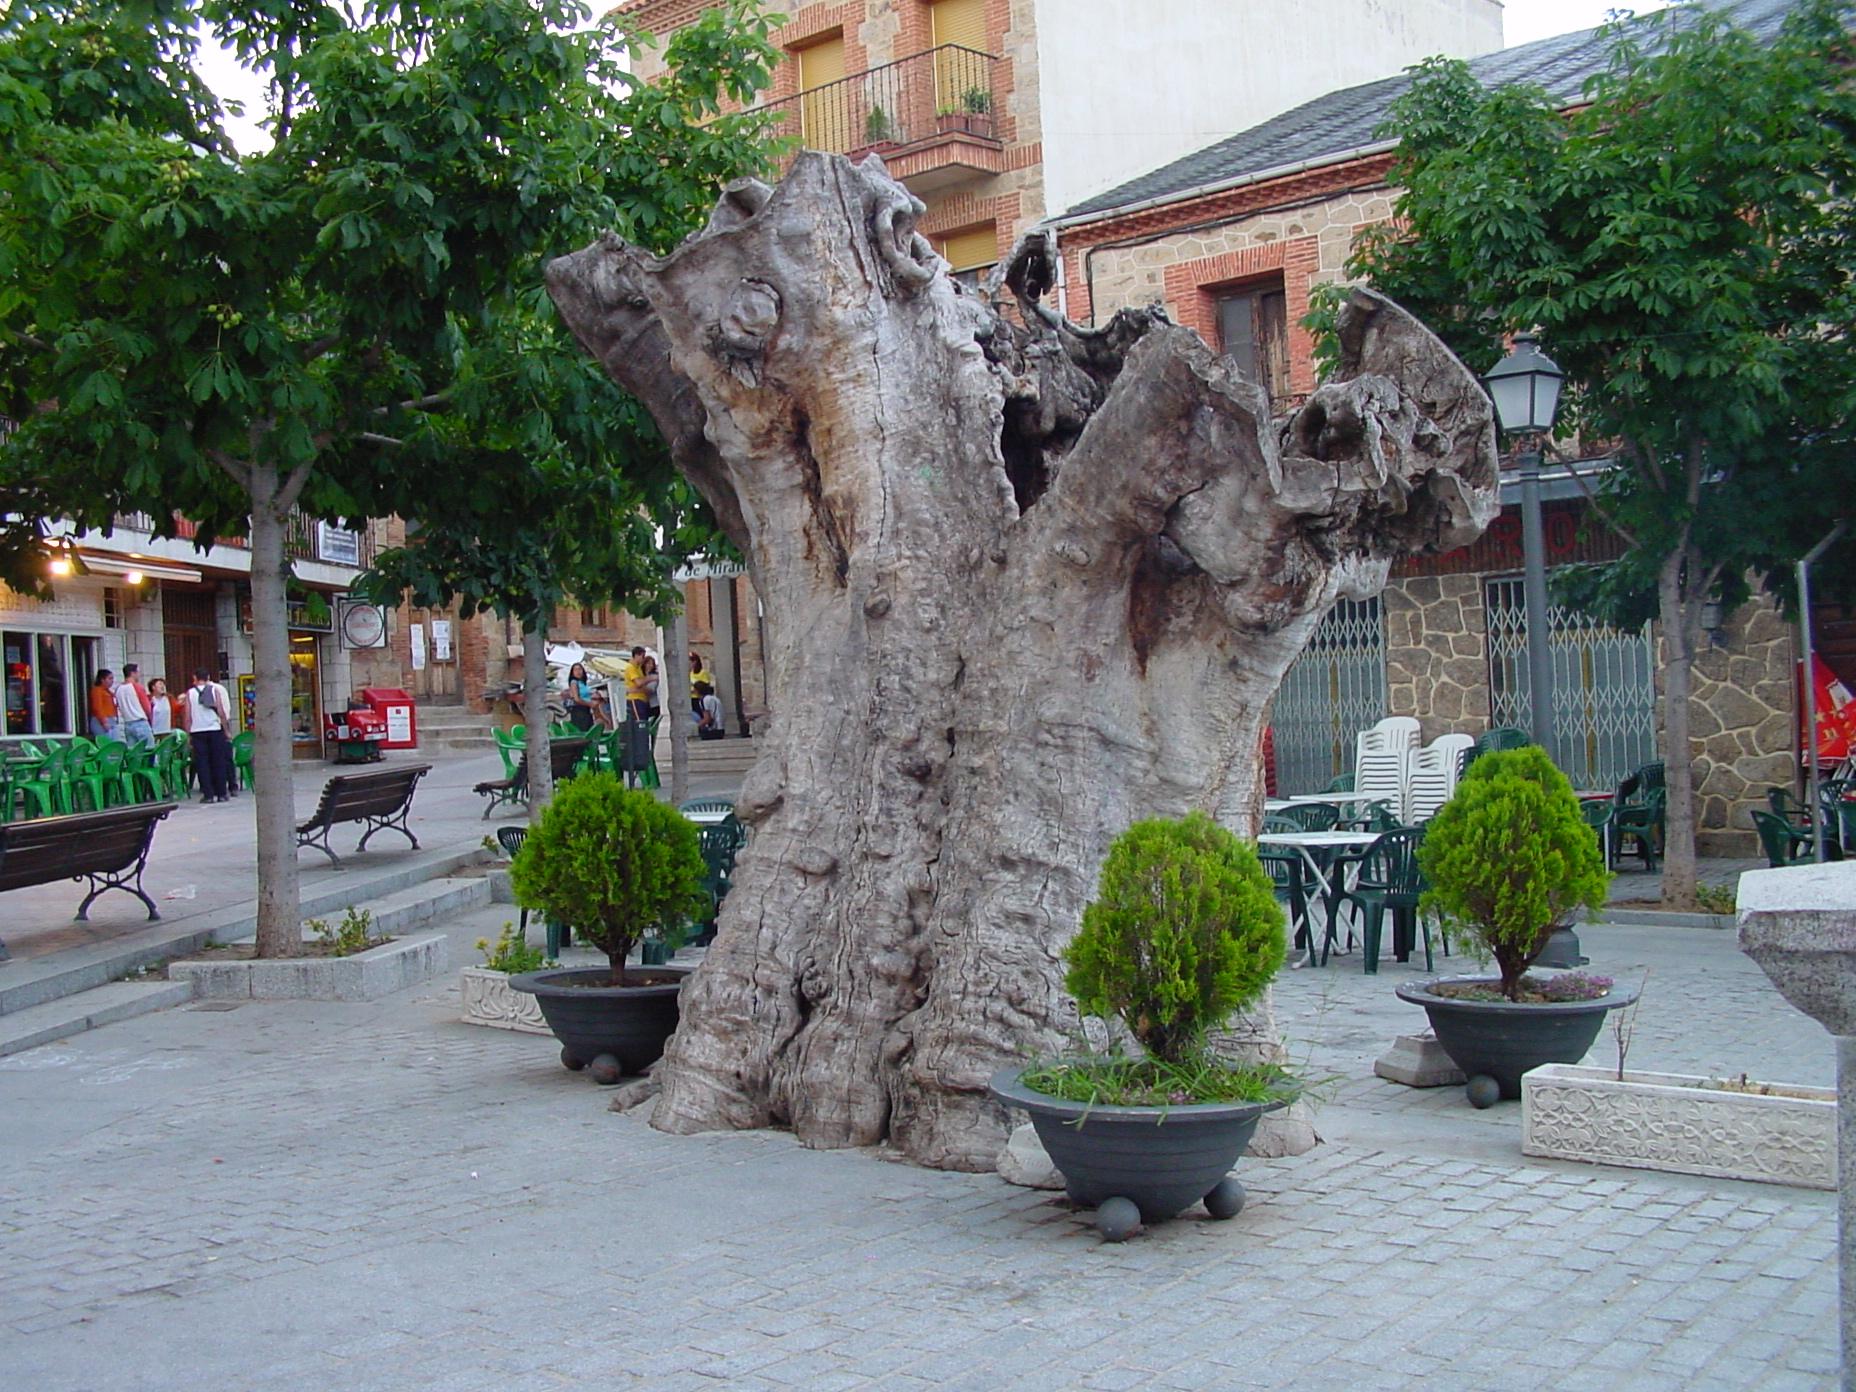 Plaza del Álamo, en Miraflores de la Sierra (Madrid)